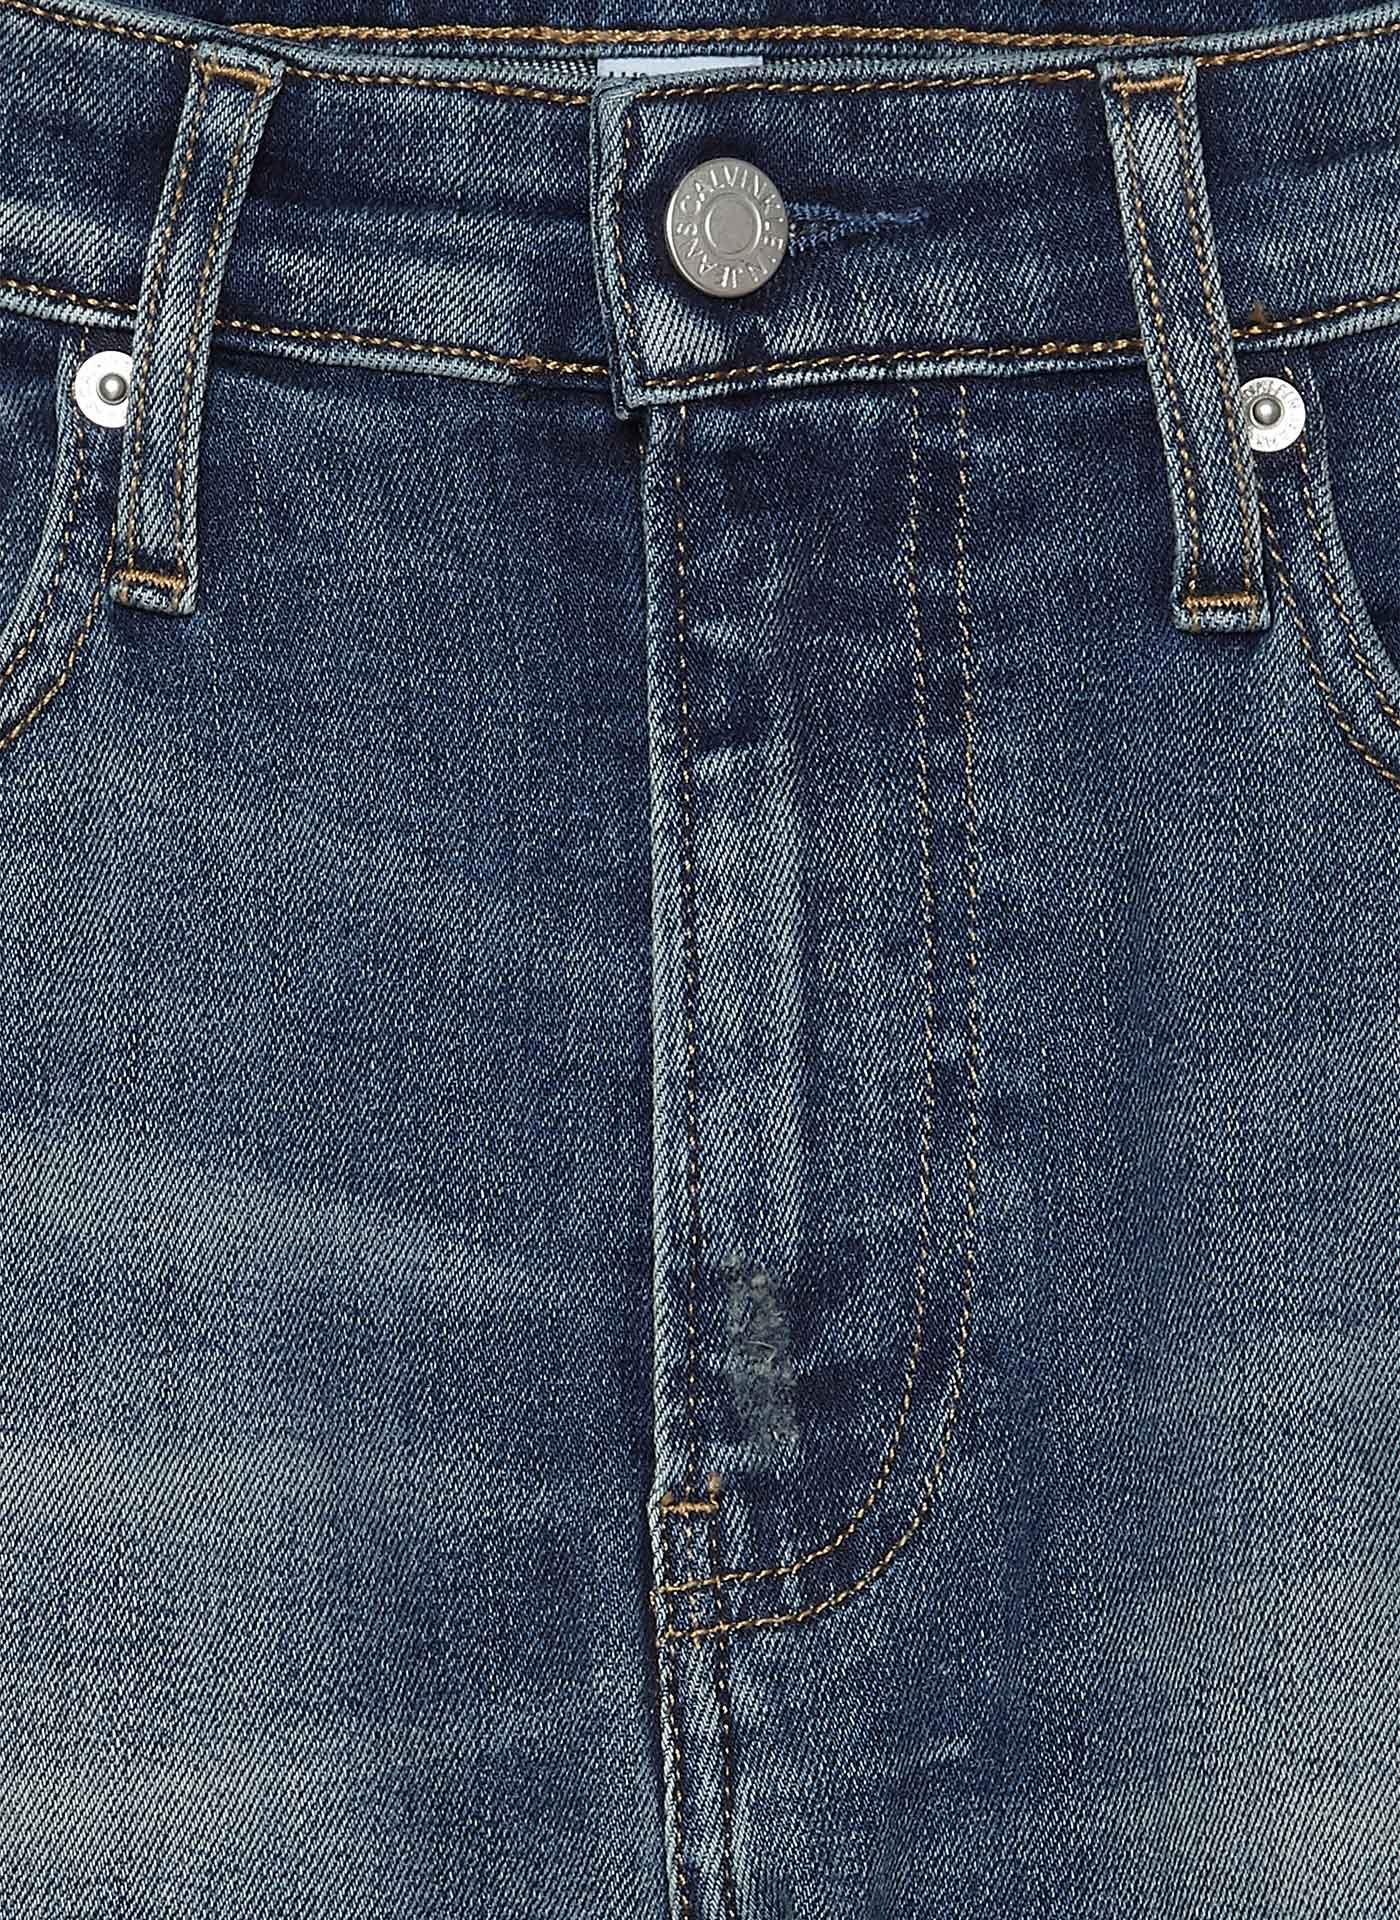 blue denim jeans close up